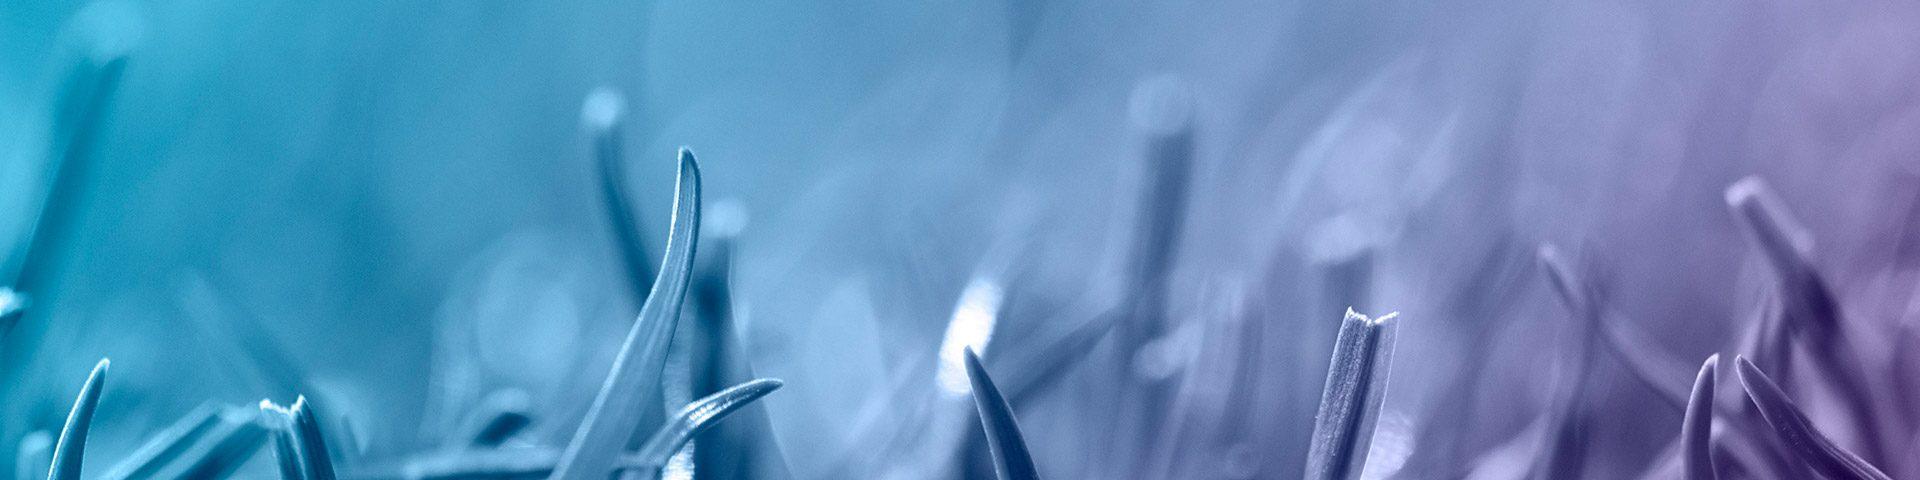 qPCRBIO Probe 1-Step Go Image Banner